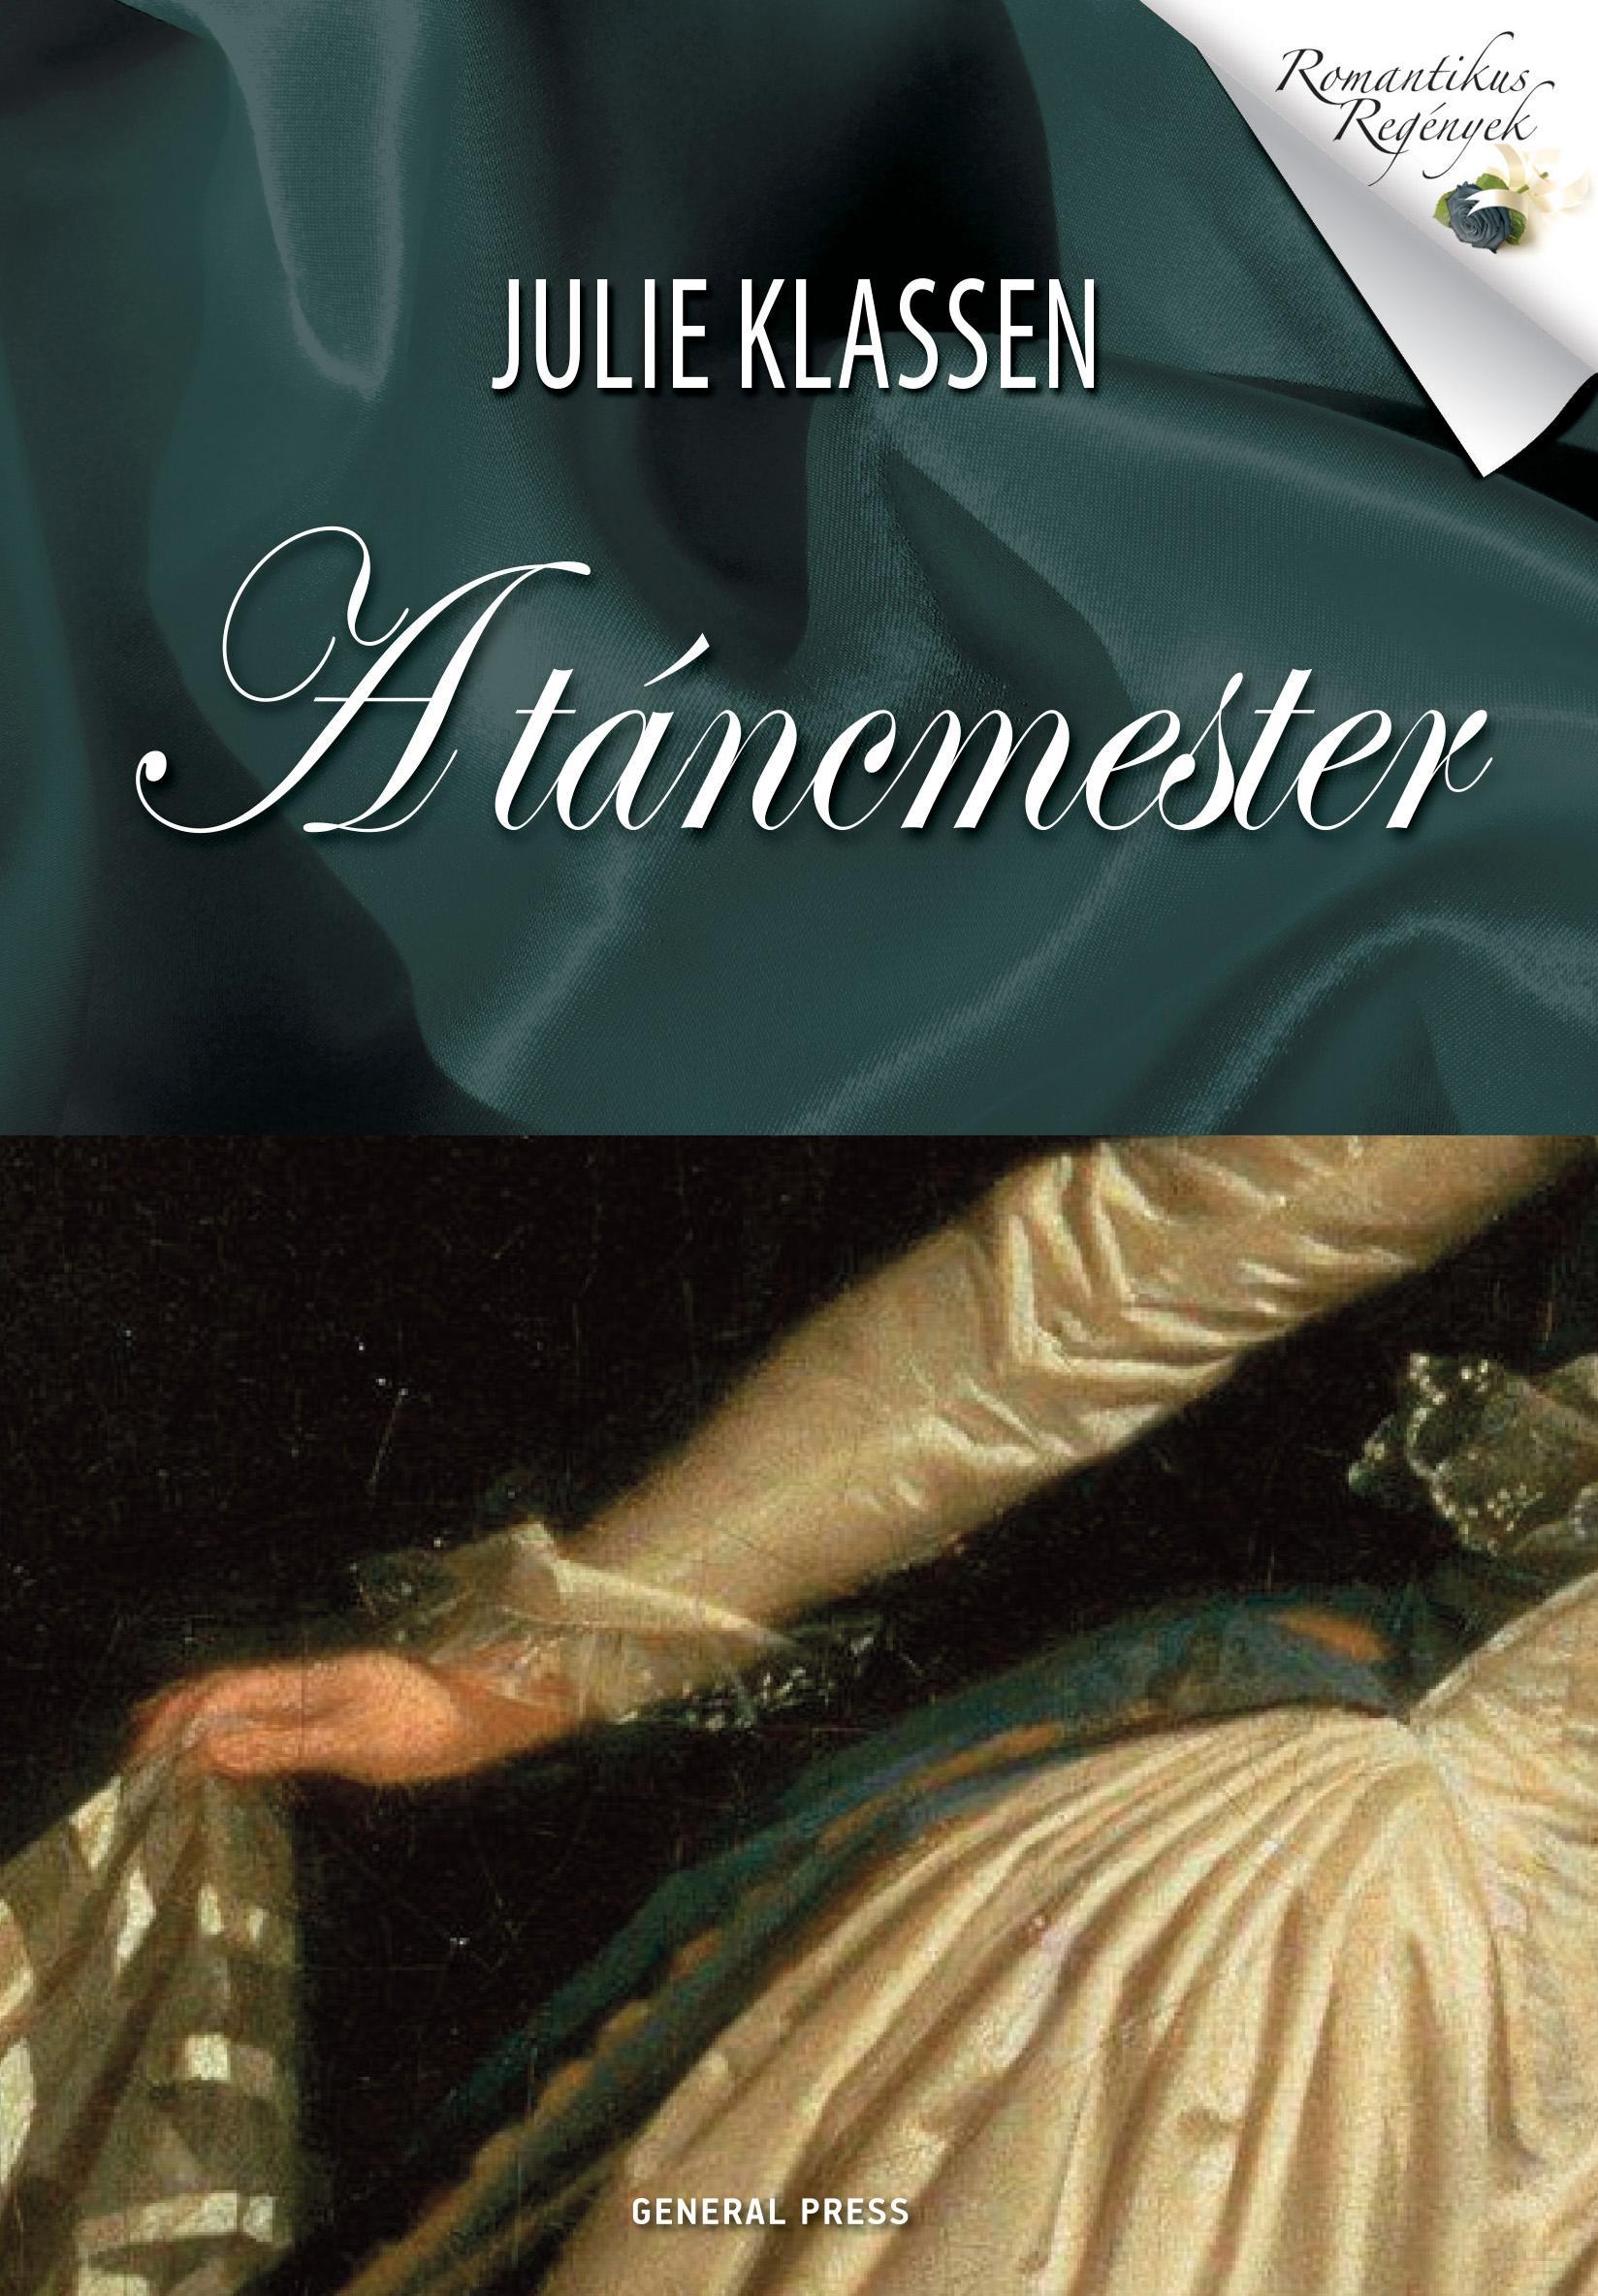 Julie Klassen: A táncmester